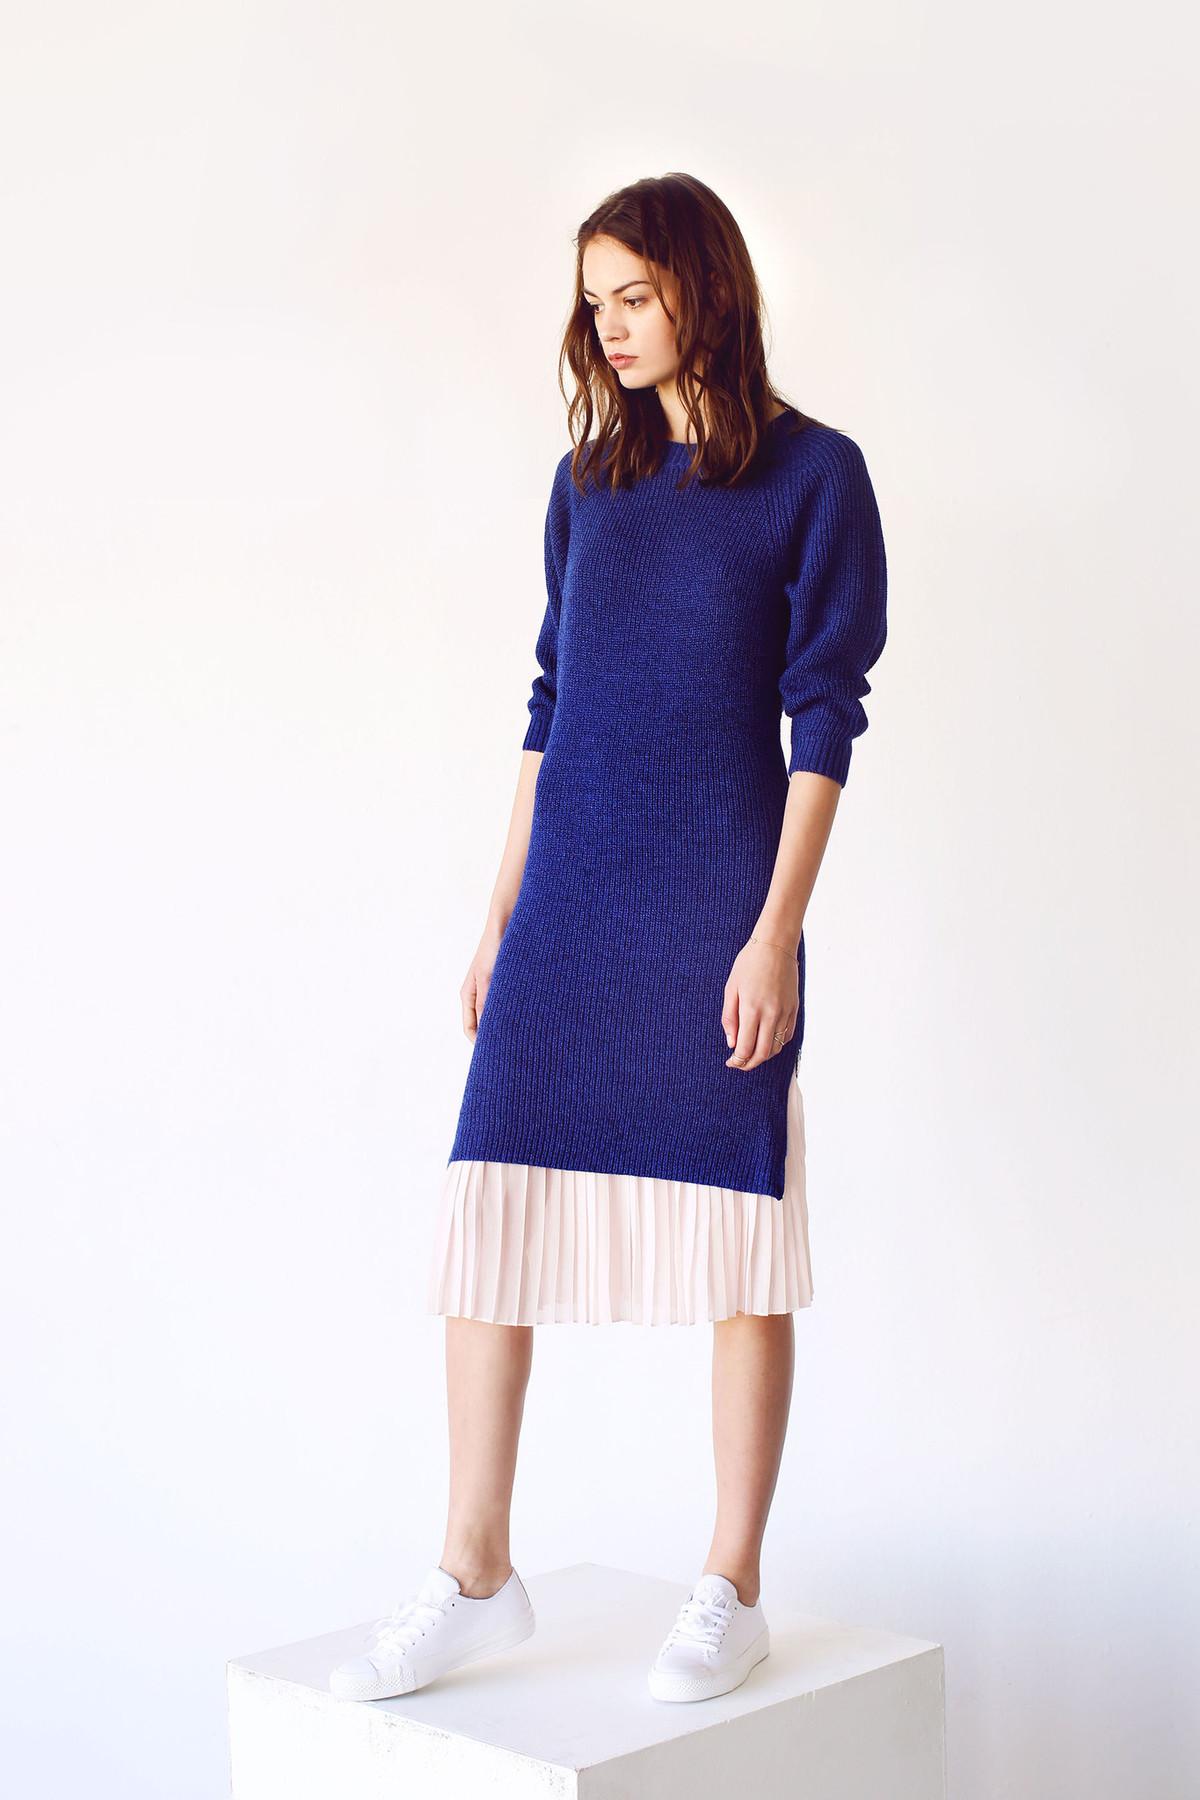 Cosette Cecilia Sweater Dress Royal Blue Garmentory